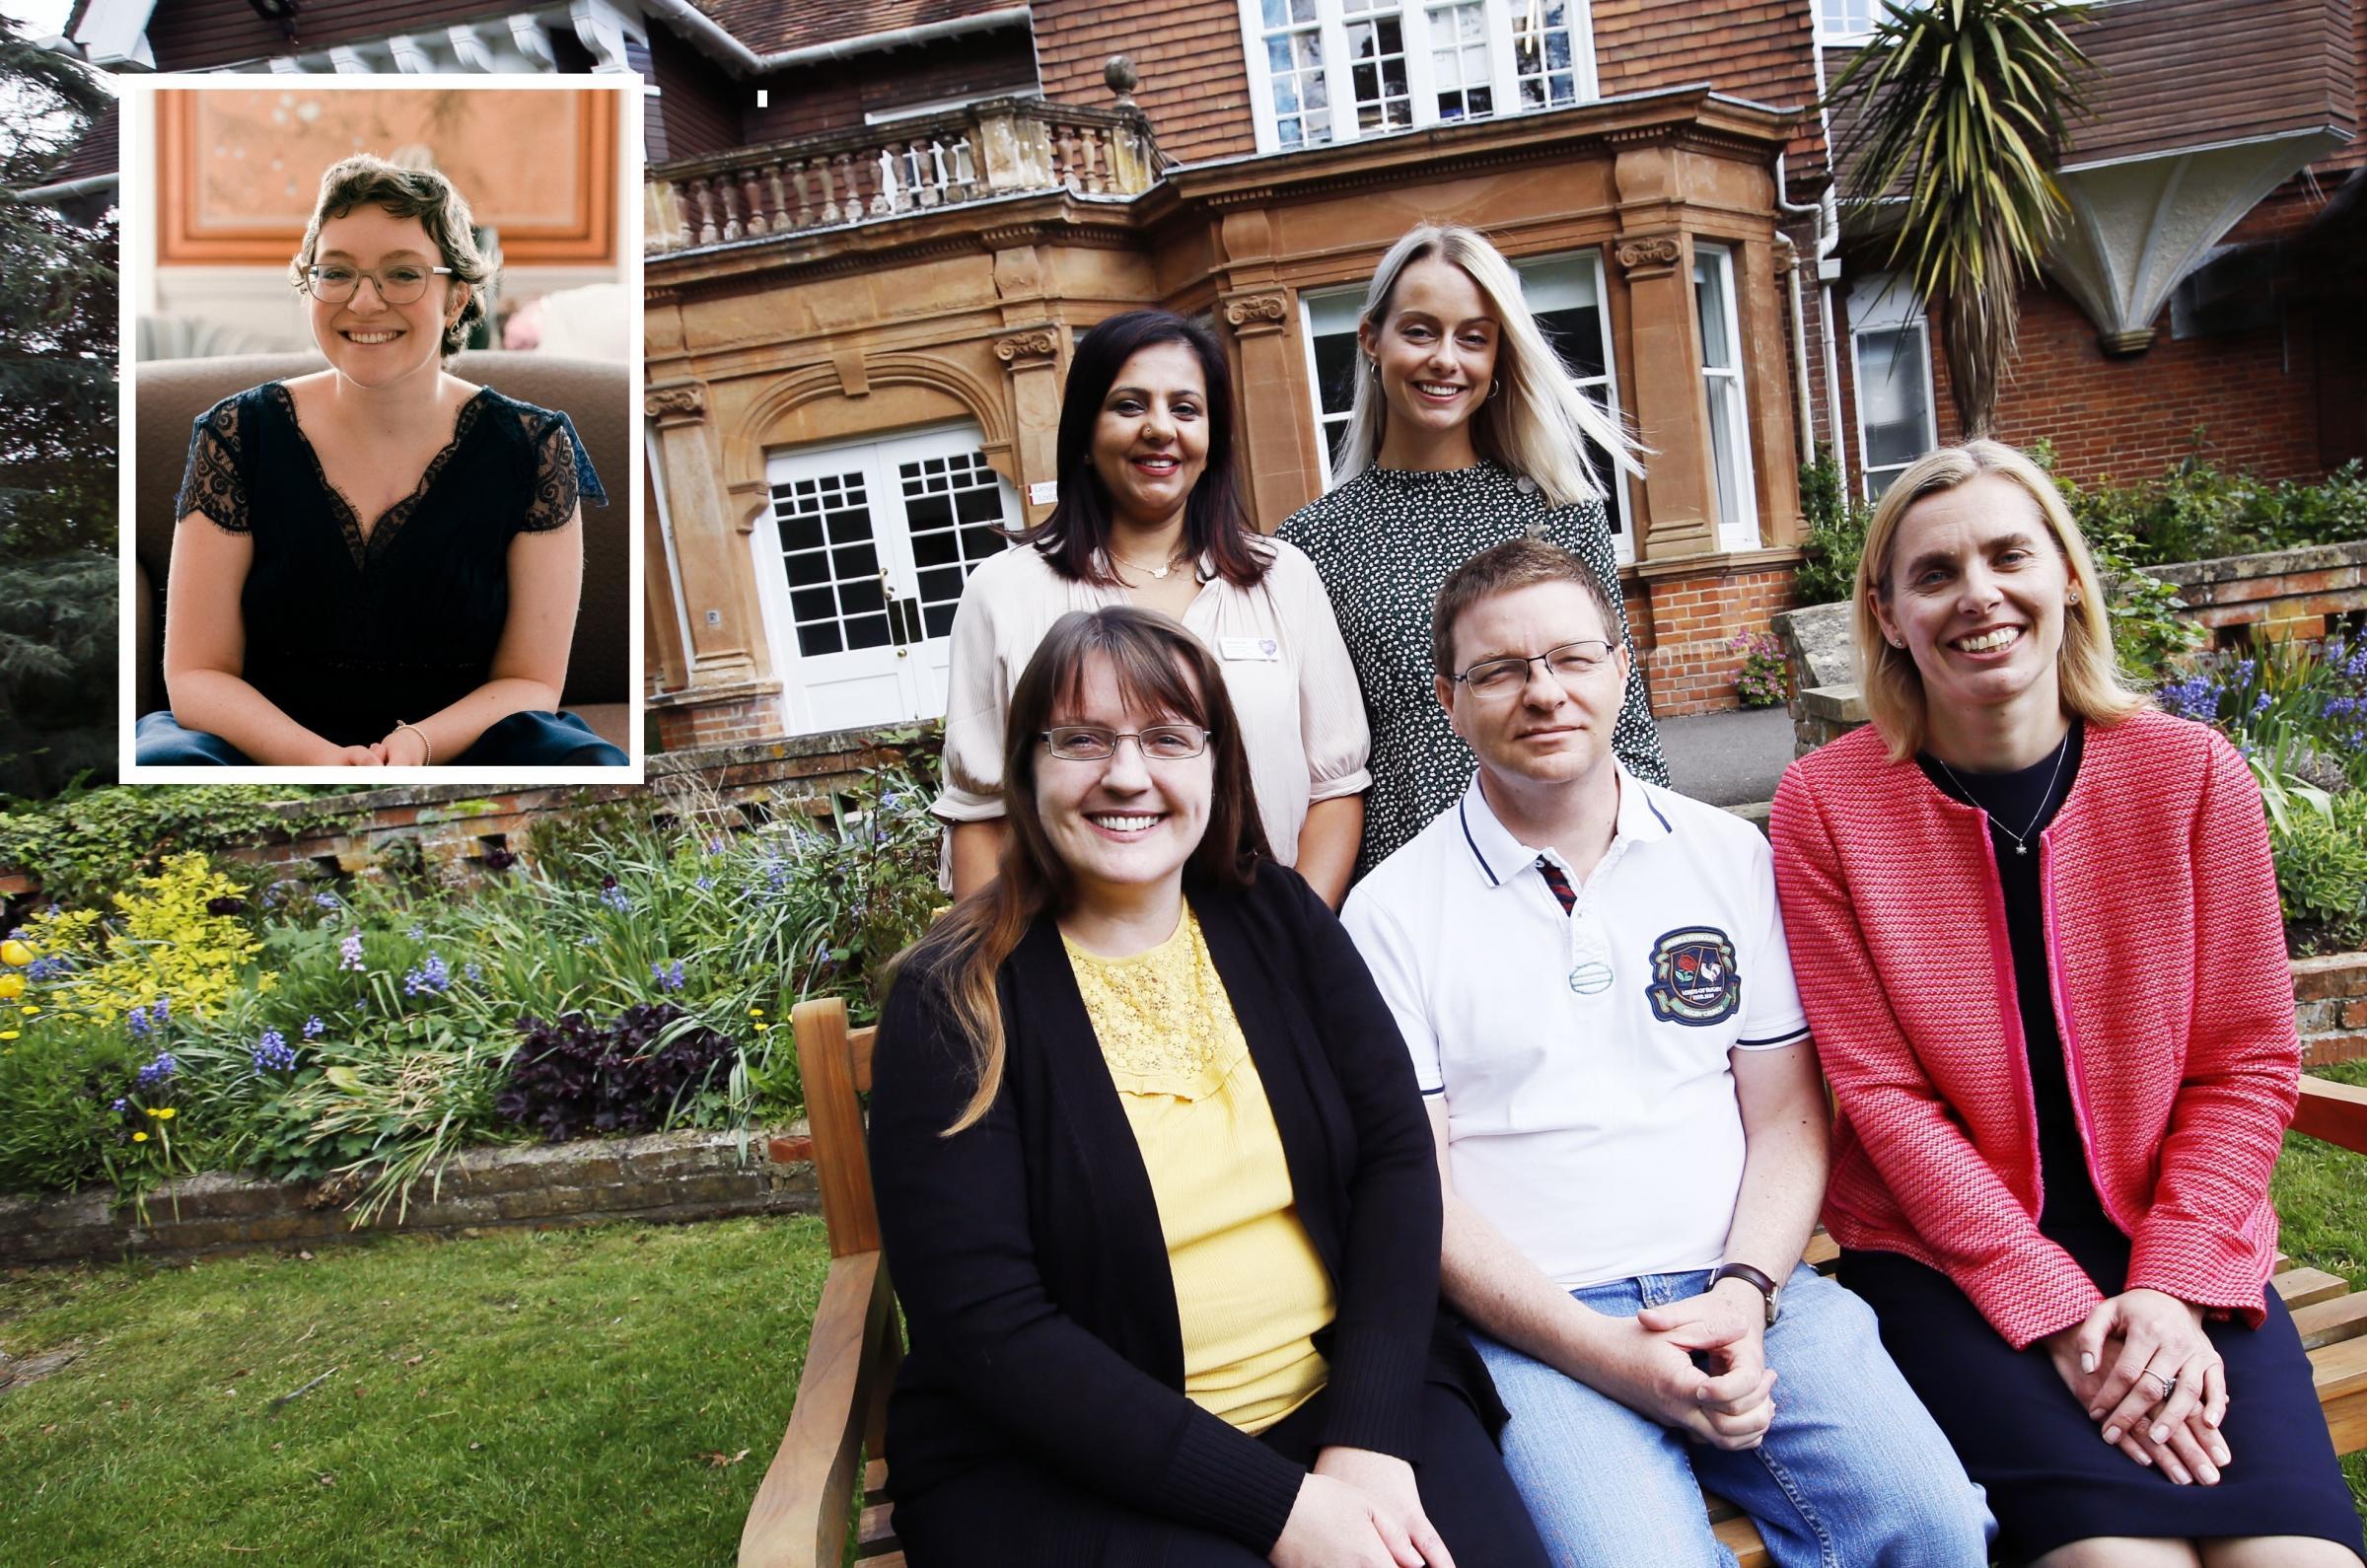 Rebecca Henderson who kept heart in a rucksack inspires appeal